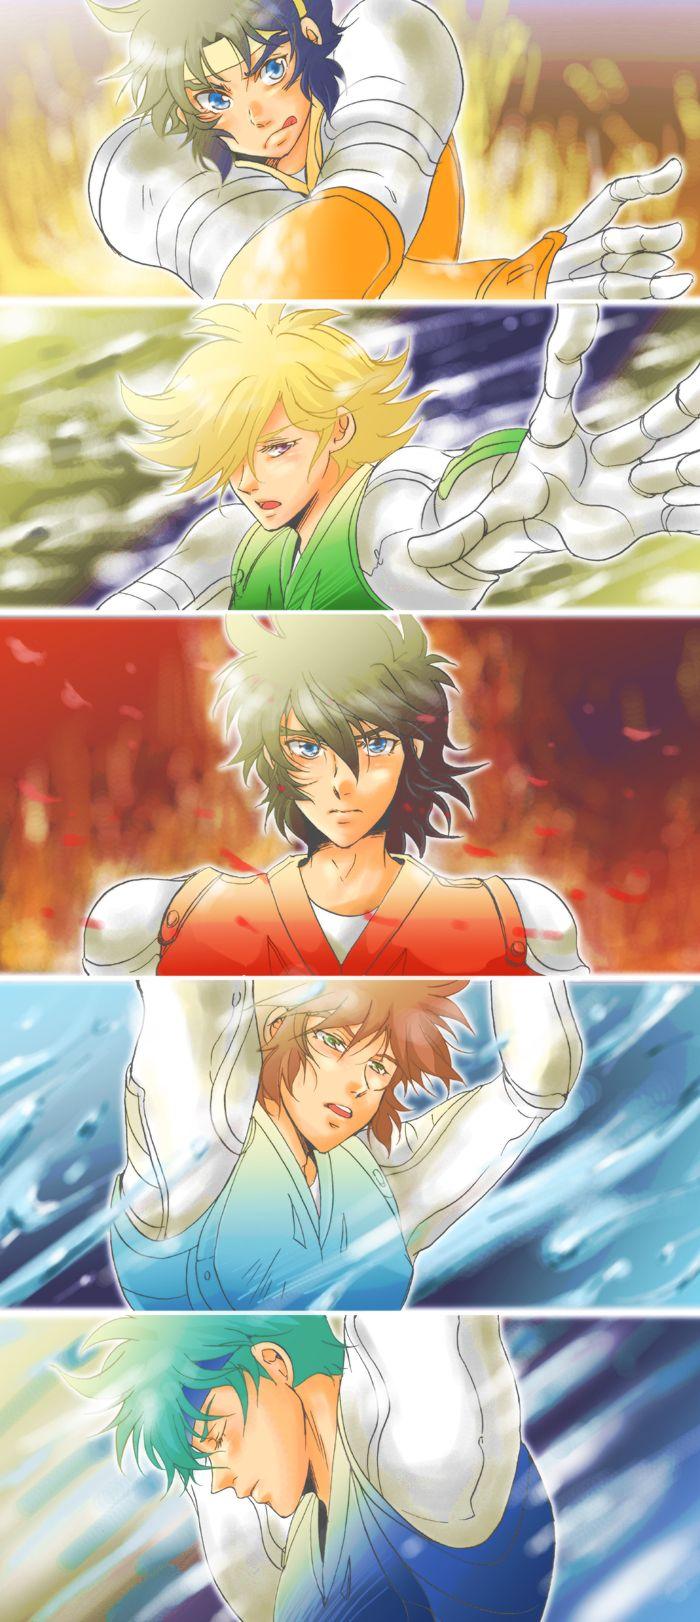 Samurai Reflections — gizmo1022 ひろ I just love this